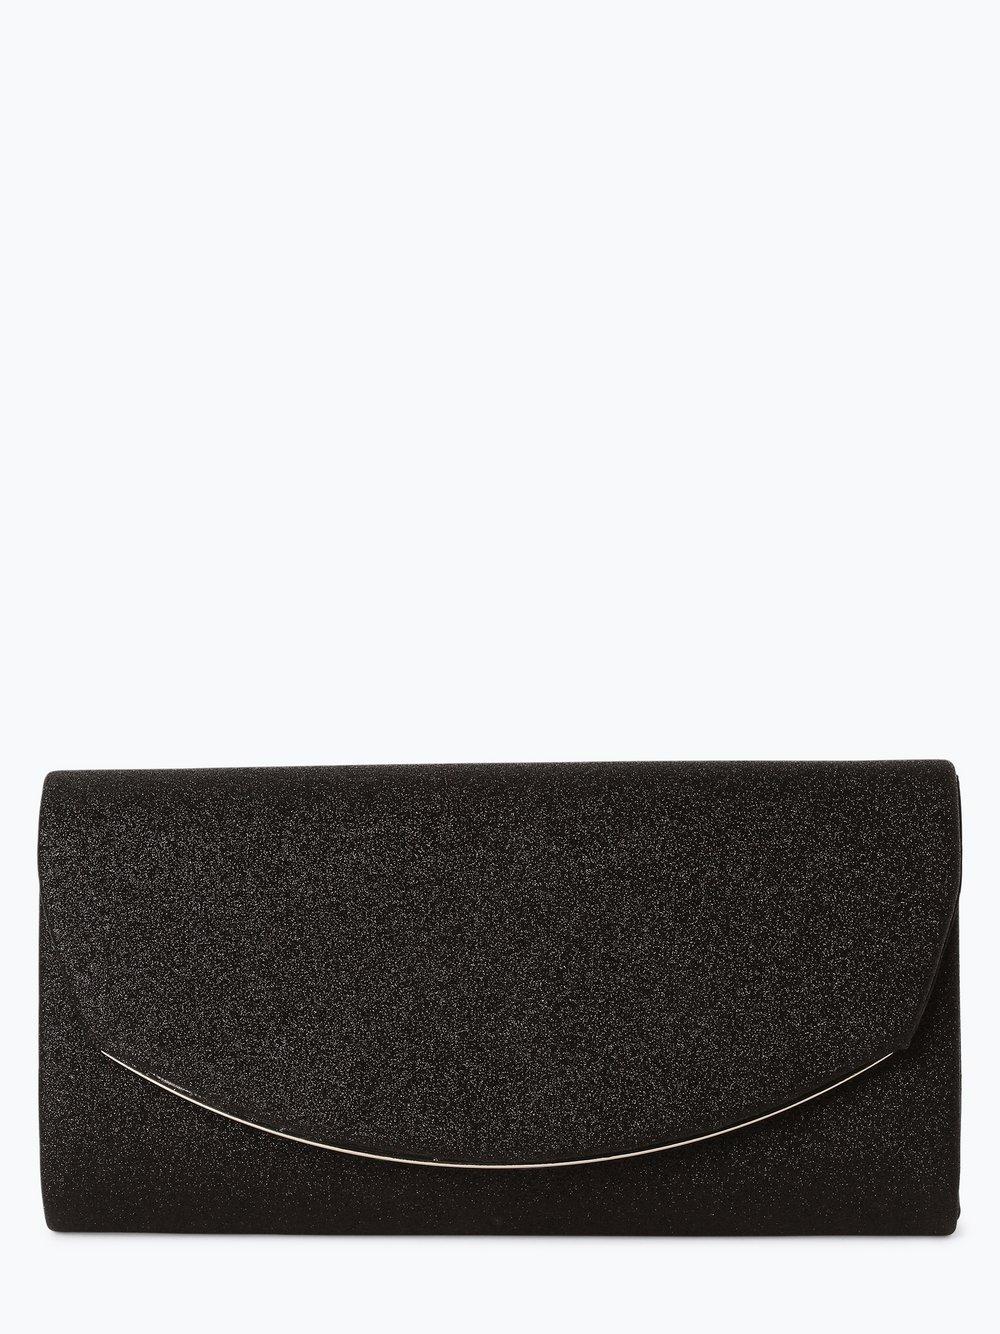 Apriori - Kopertówka damska, czarny